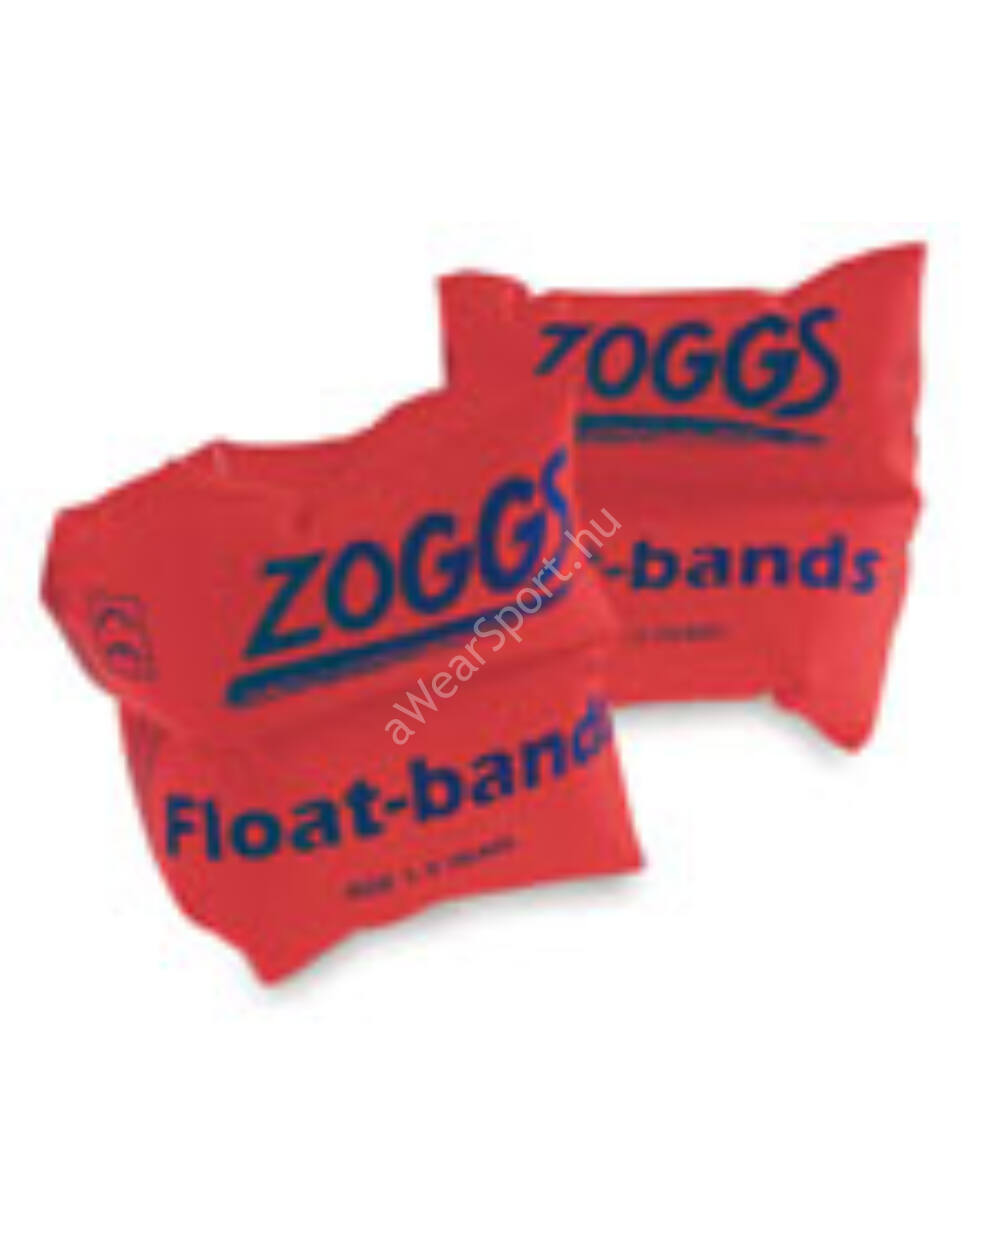 Zoggs karúszó 0-1 éves korig, max.12,5kg-ig